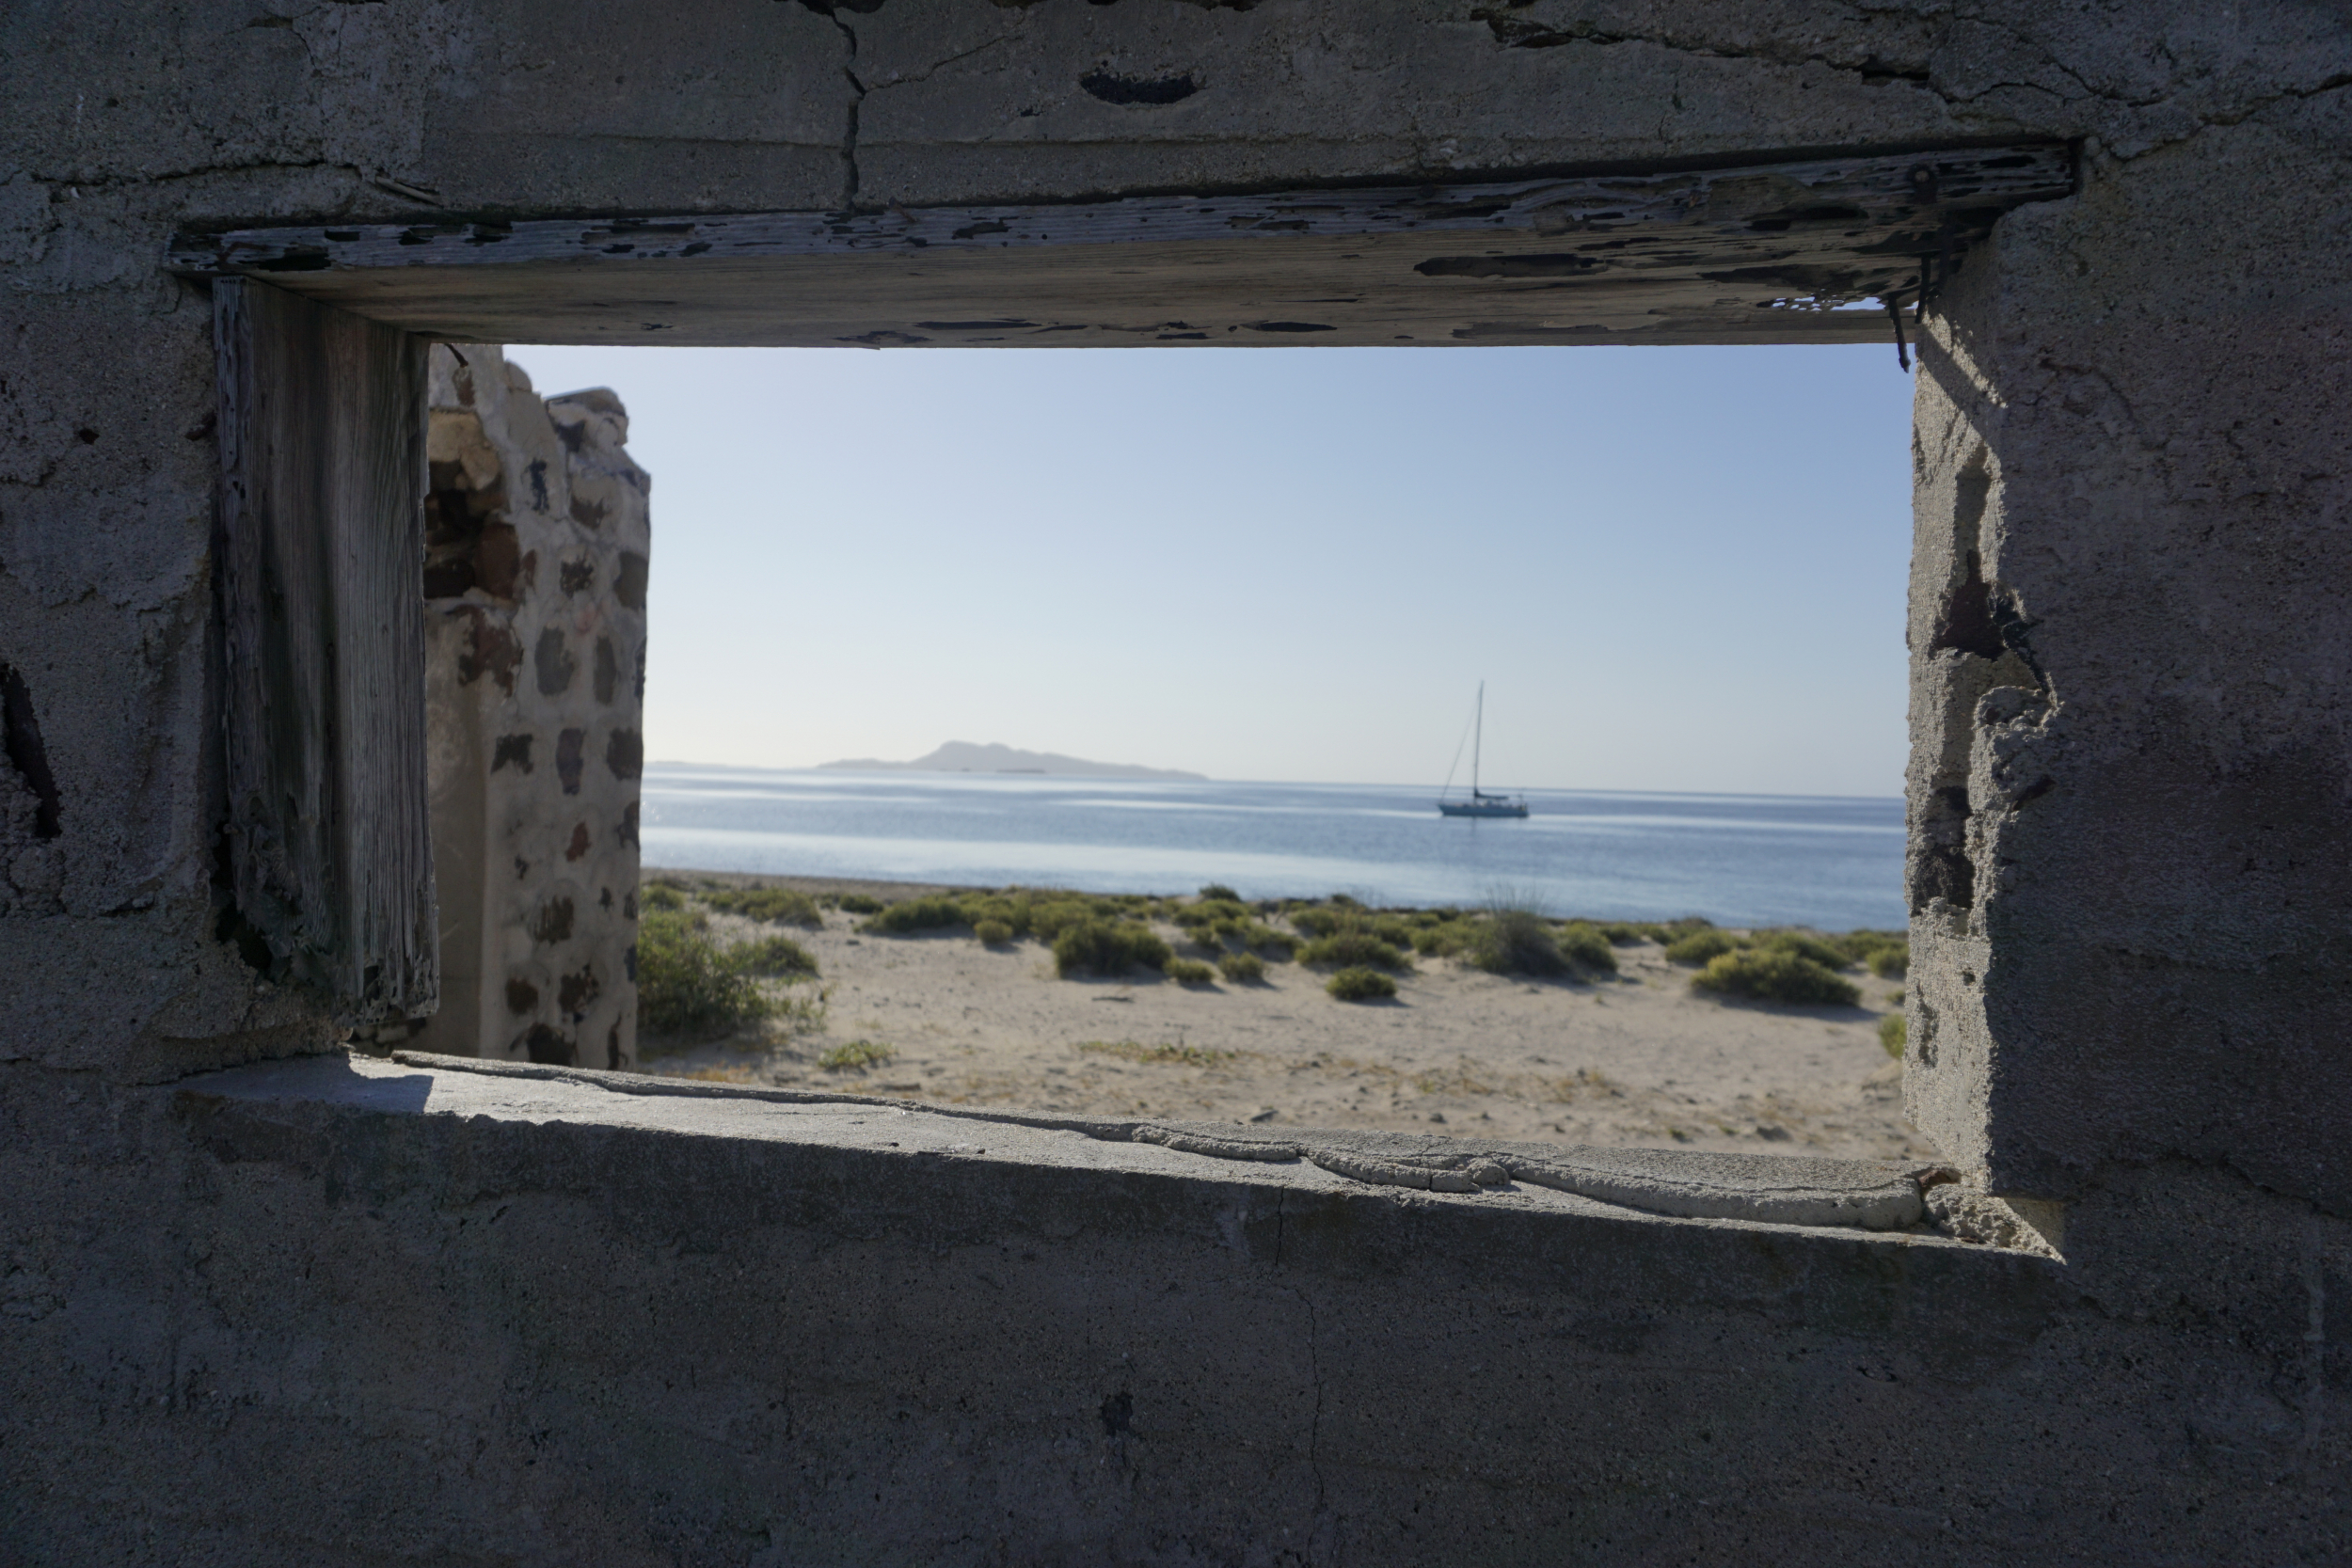 24. Abandoned salt mines at Punta Salinas